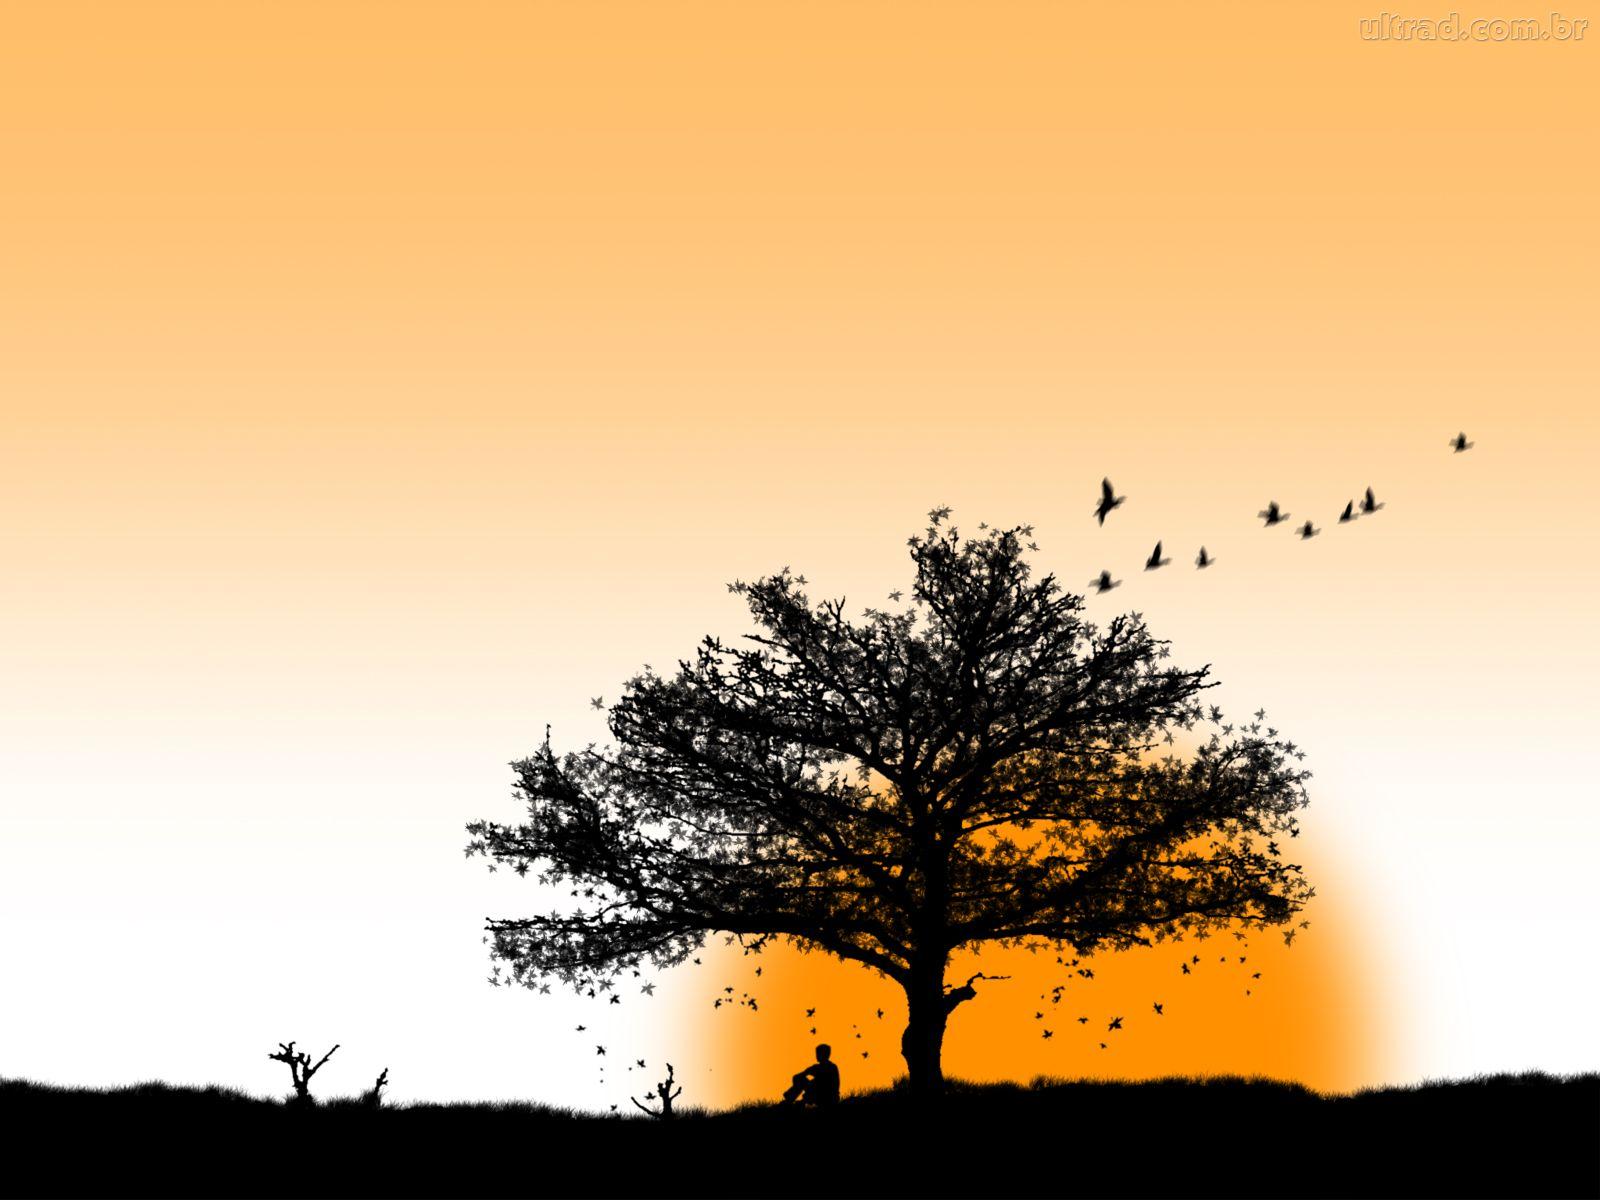 Poesias Para Refletir: Paz E Harmonia